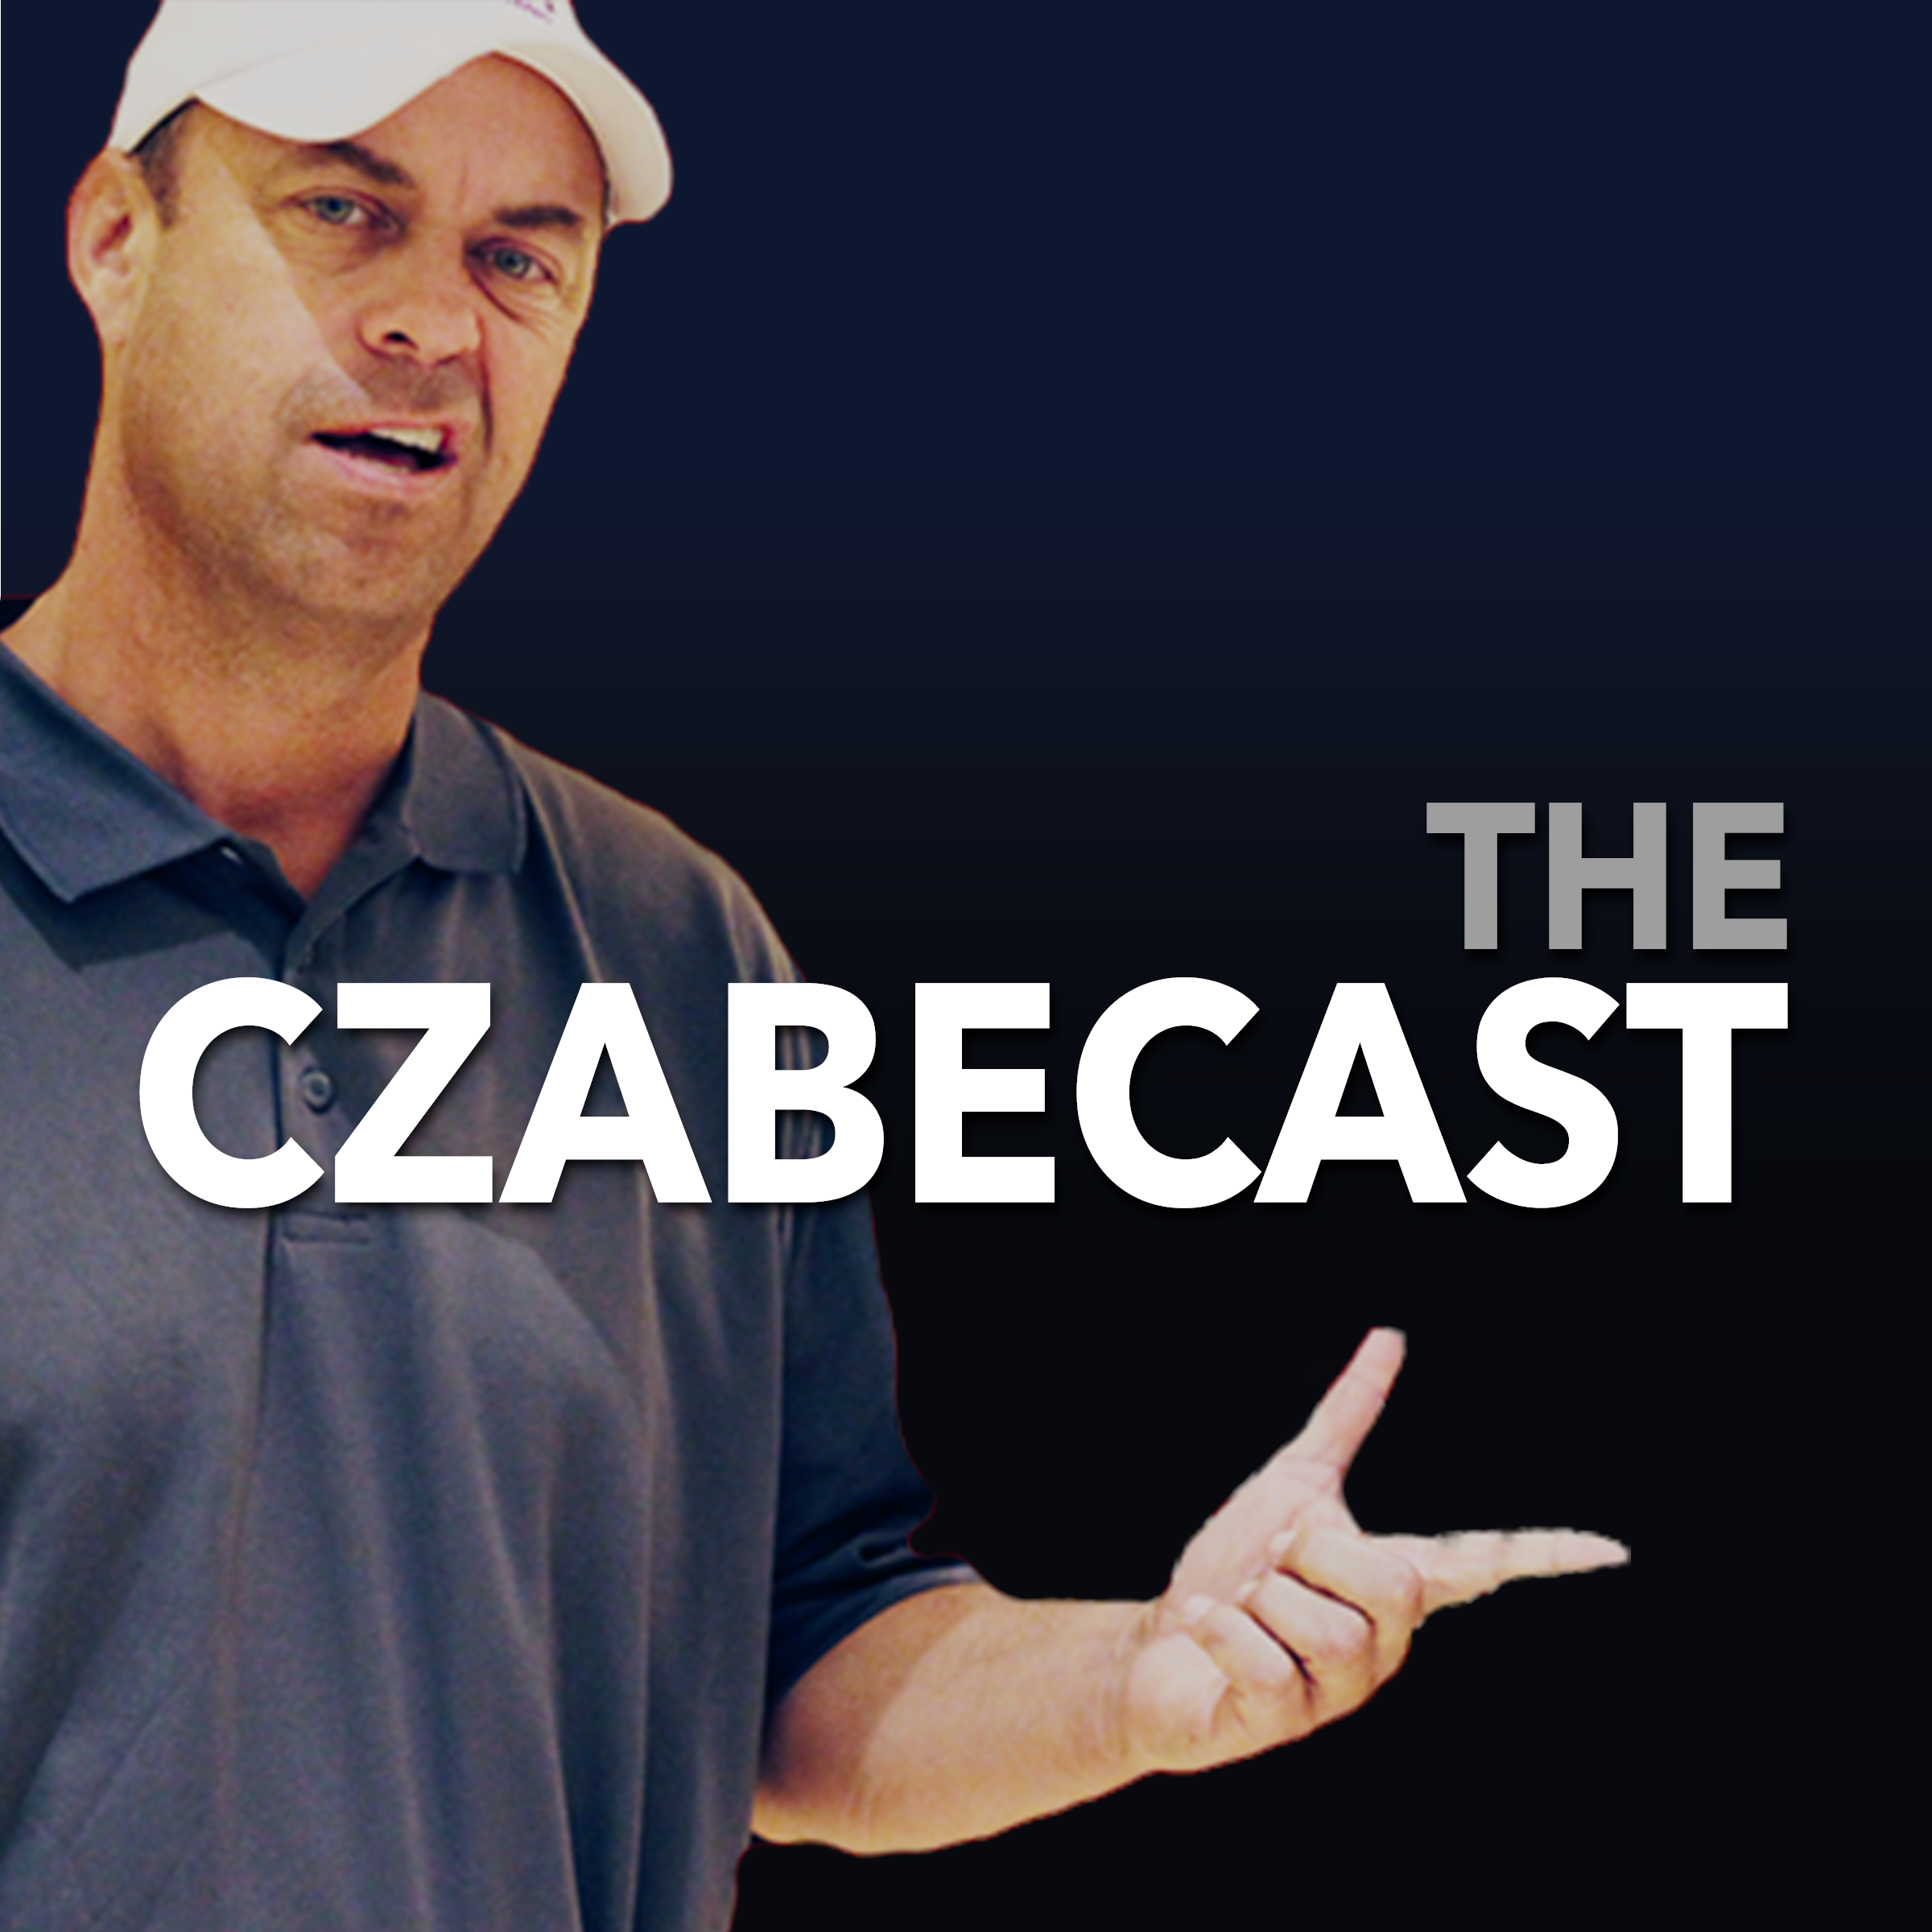 CzabeCast show art